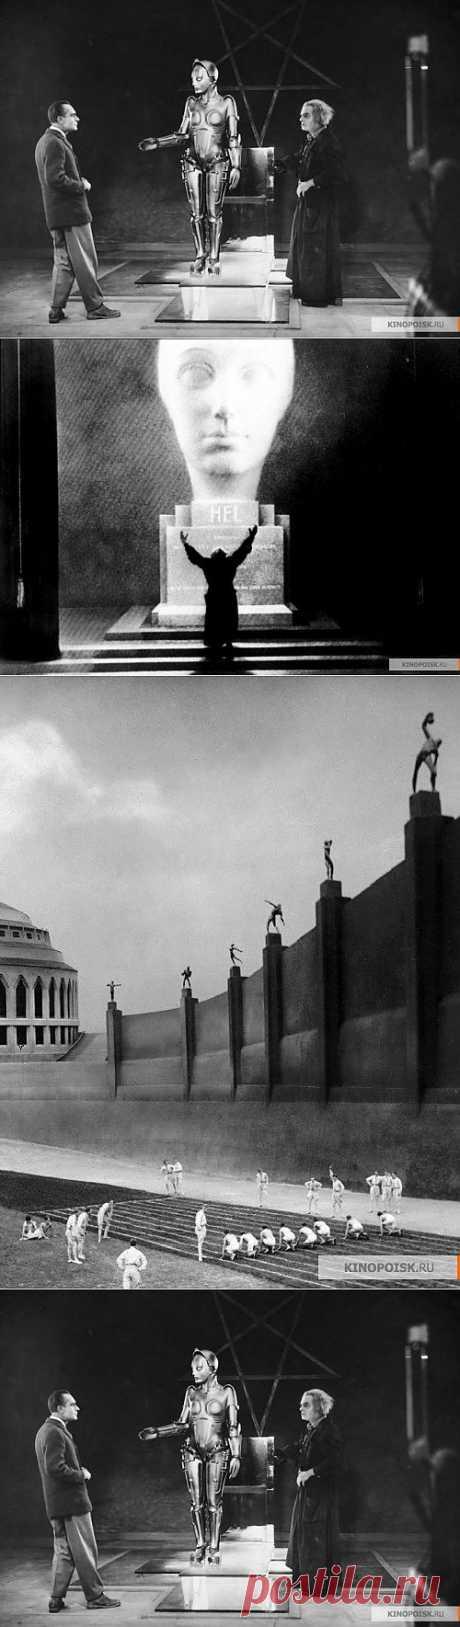 "Фильм ""Метрополис"" Фрица Ланга 1927 год."